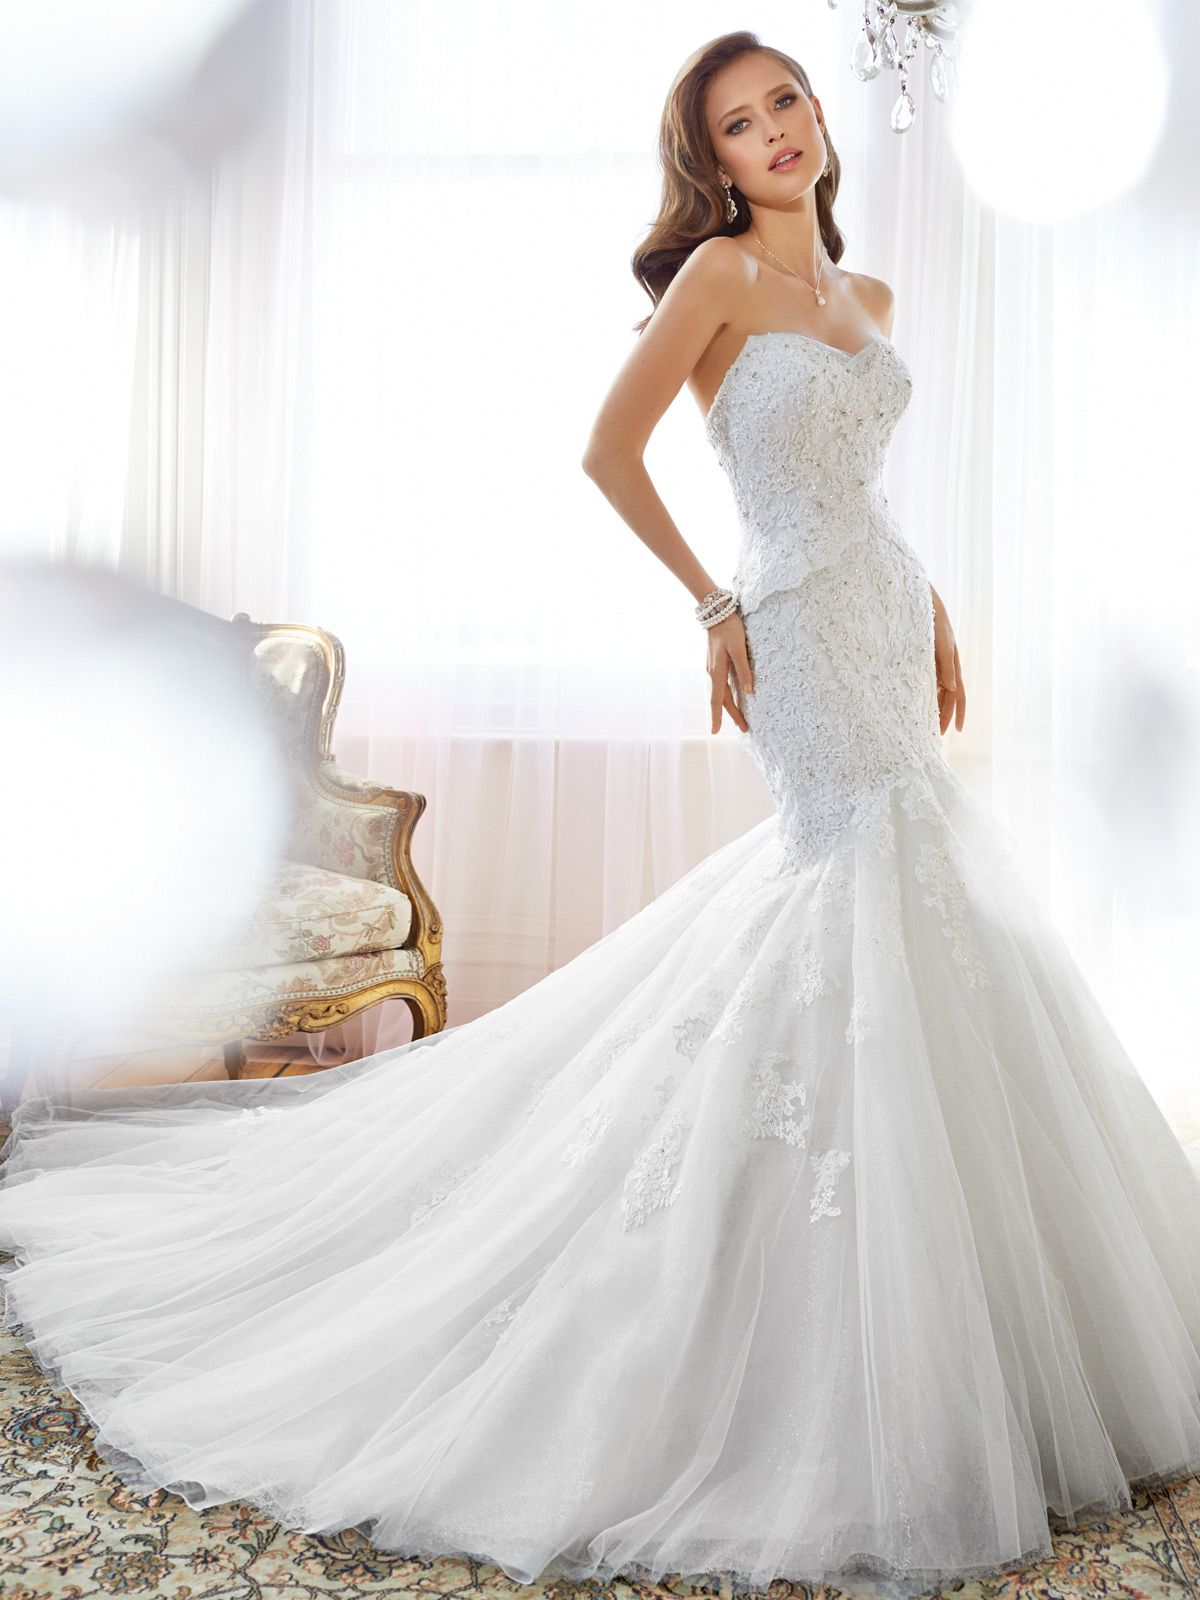 Corset for under wedding dress  Sophia Tolli Wedding Dresses  for Mon Cheri  My Wedding Ideas